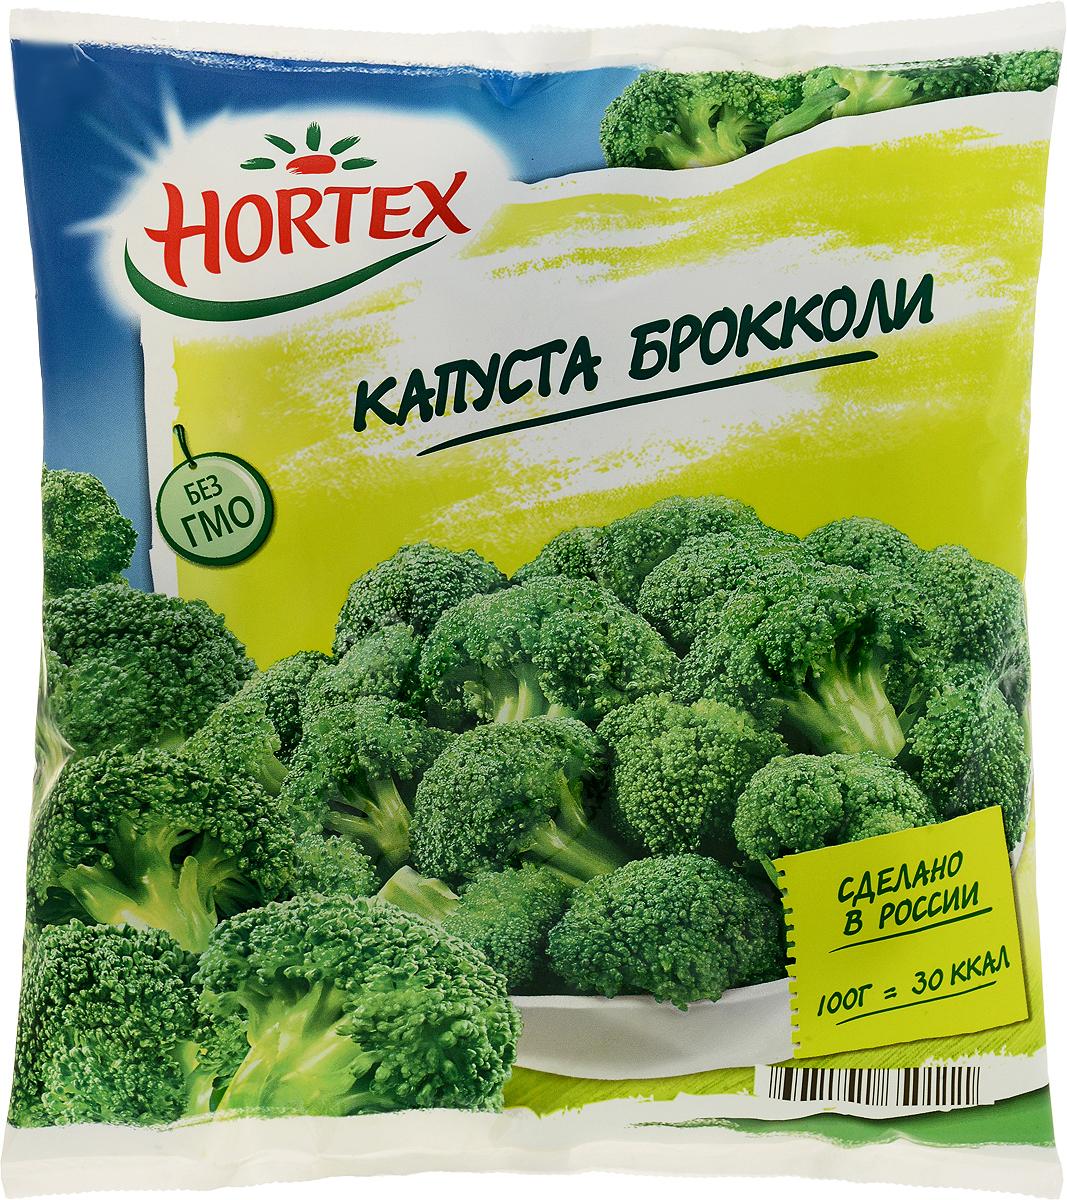 Hortex Капуста брокколи, 400 г кружево вкуса капуста брокколи 400 г